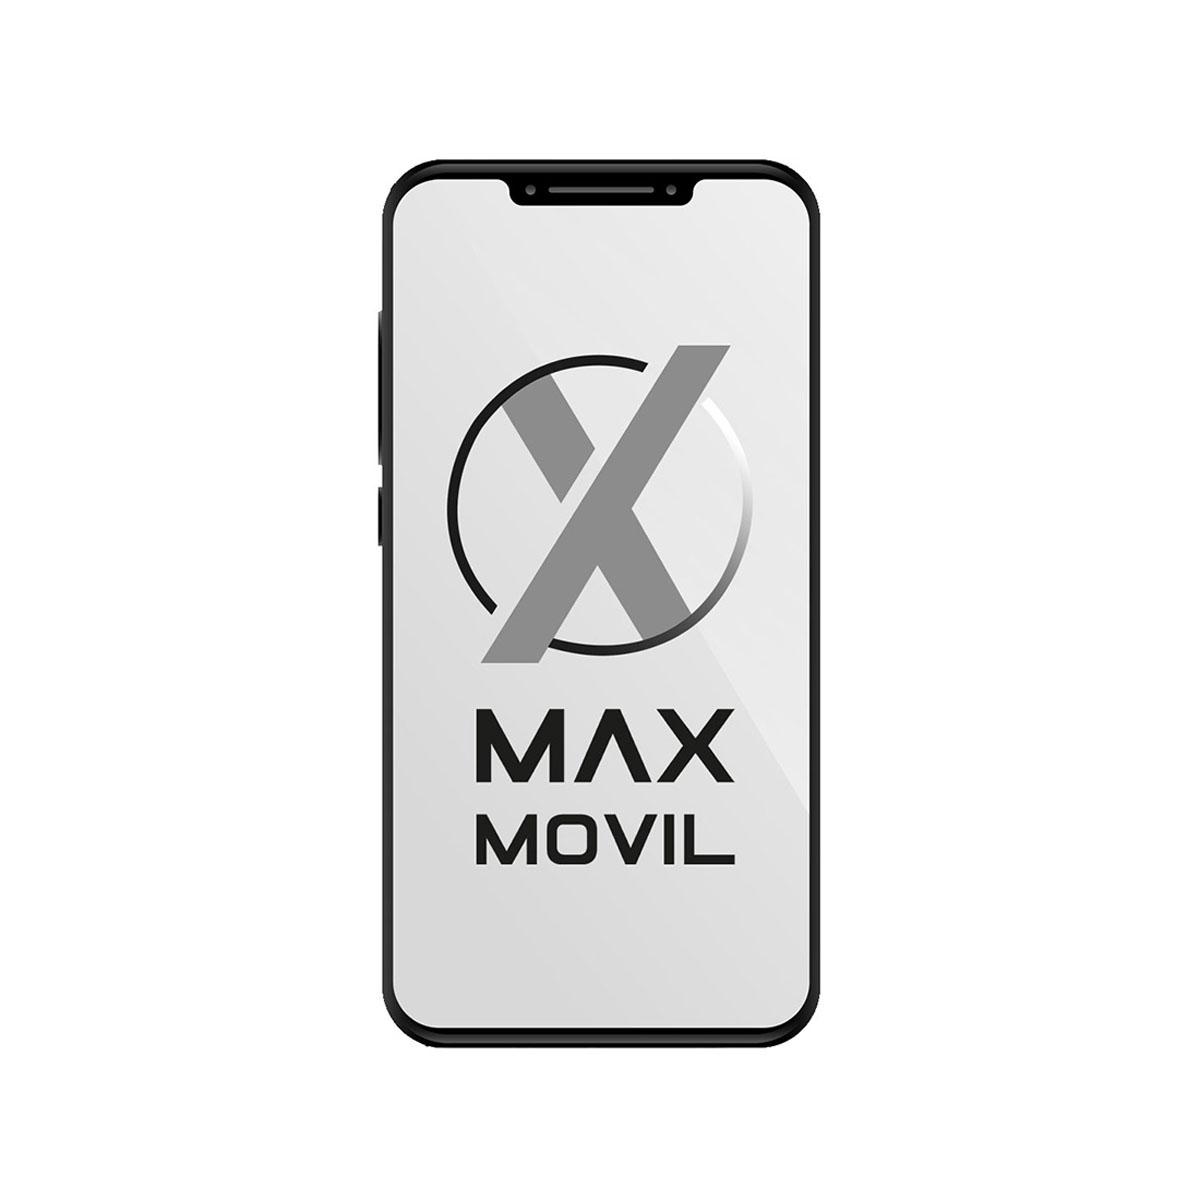 Comprar online Motorola Moto X Style blanco